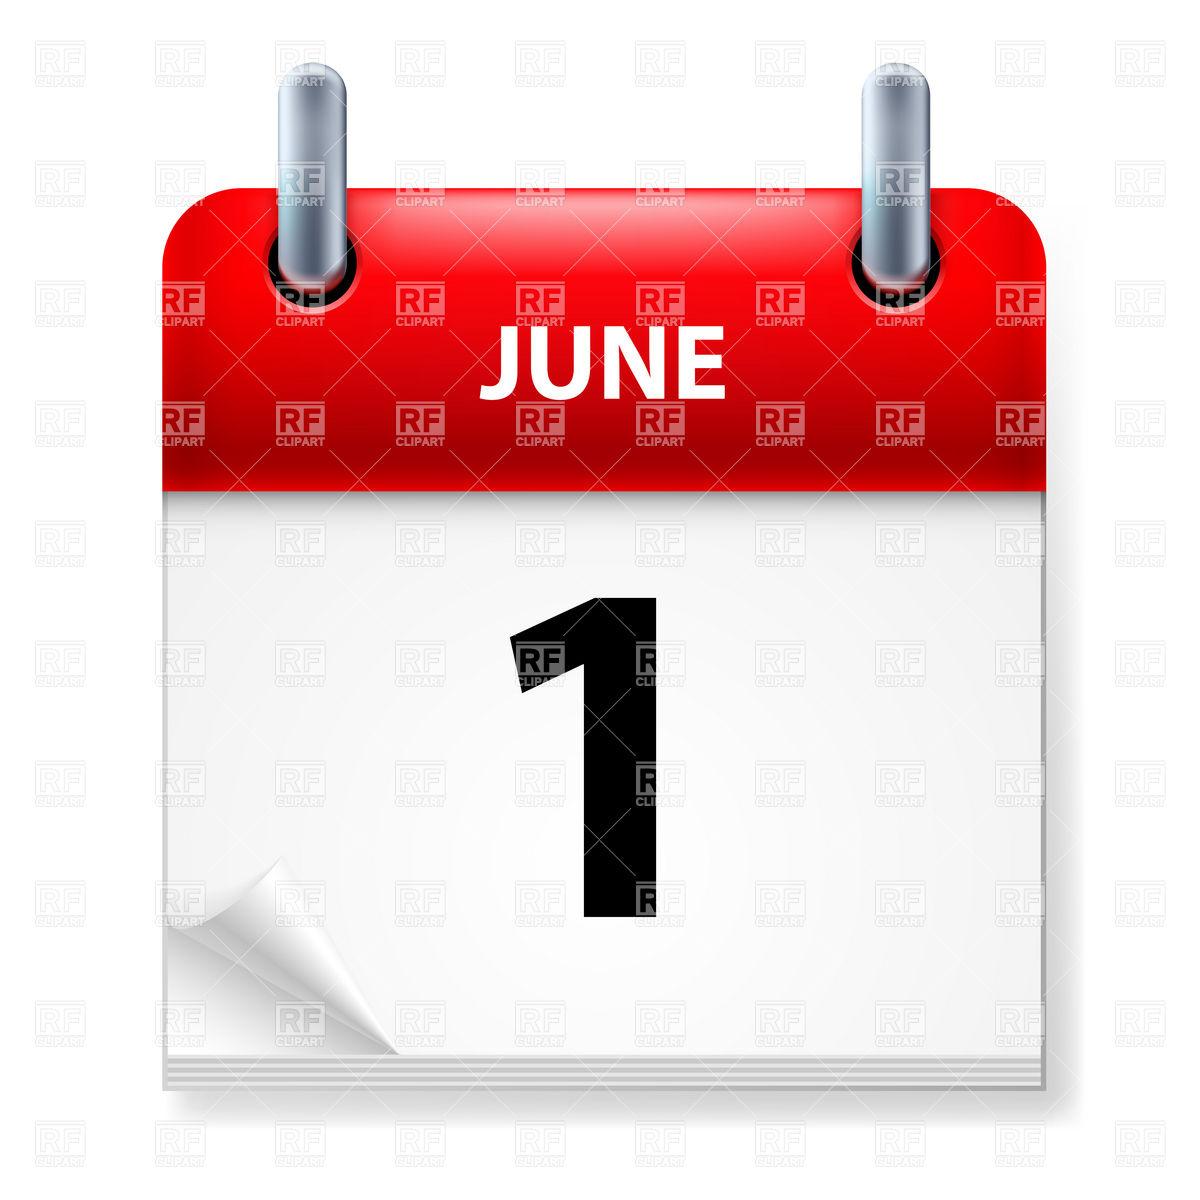 June Calendar Heading Clipart.